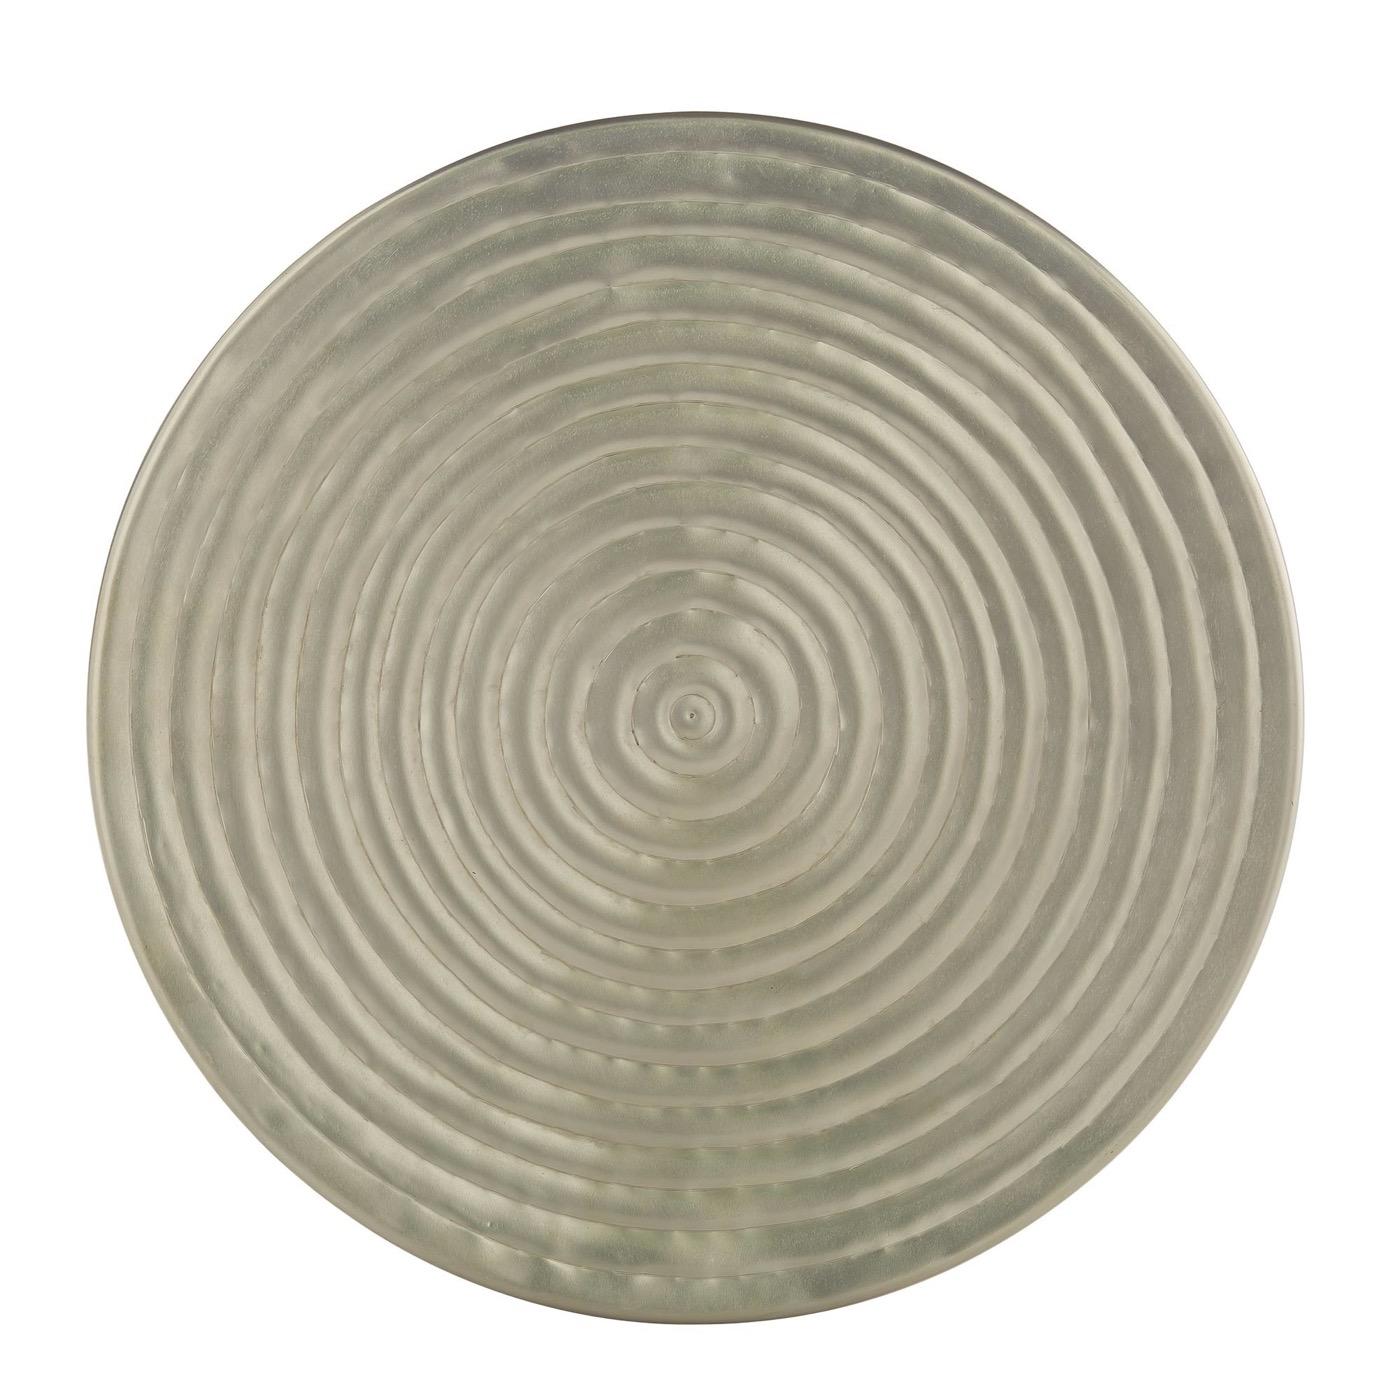 Harbon Iron Side Table | Nickel